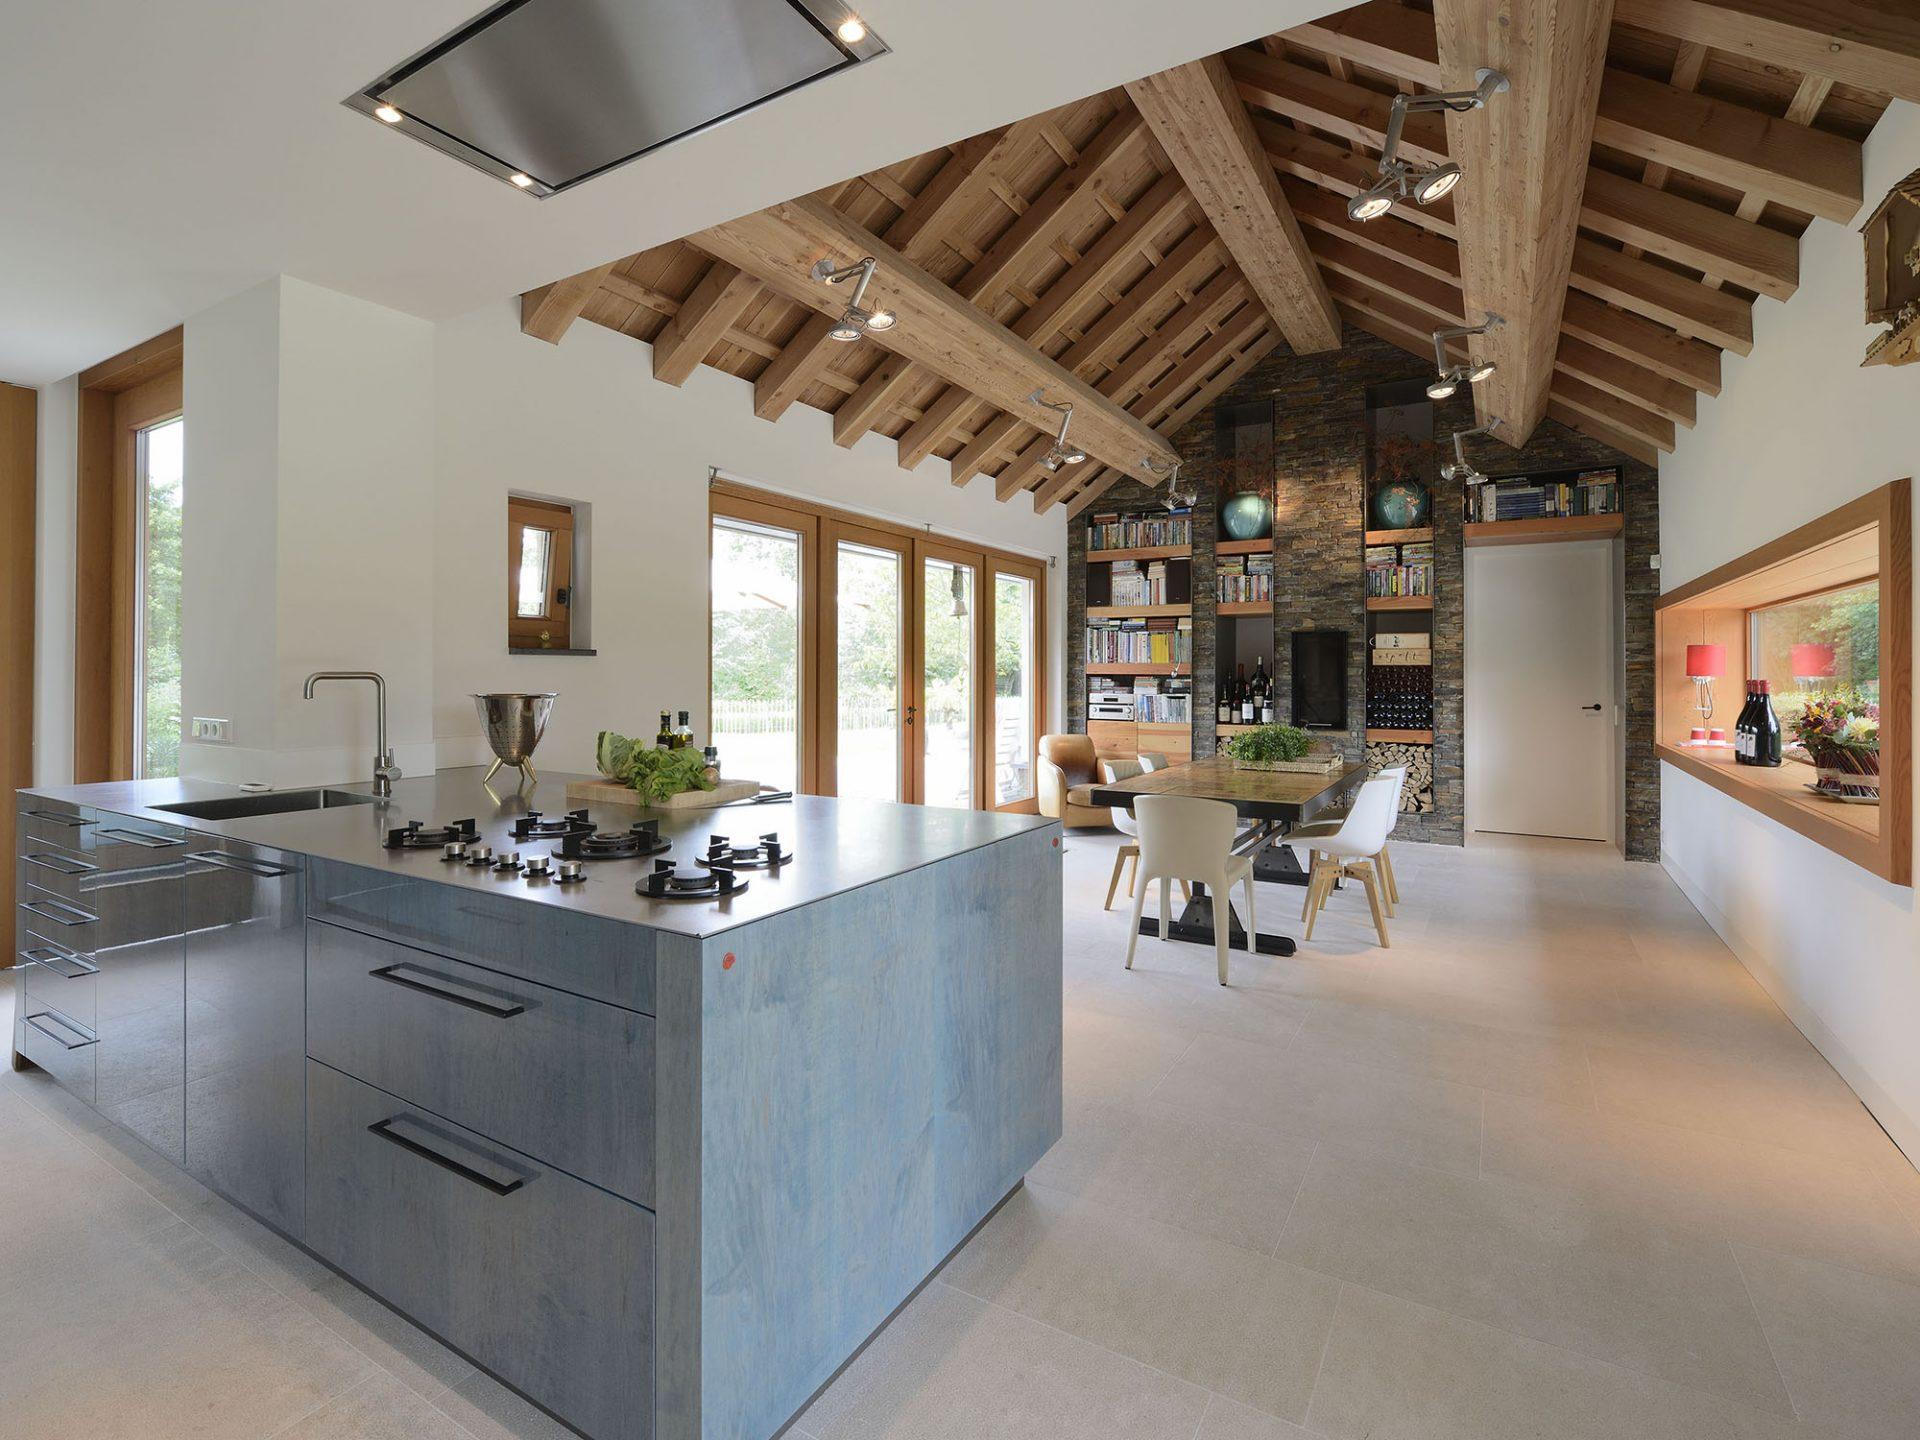 Residential keuken ontwerp met michelinster emyko